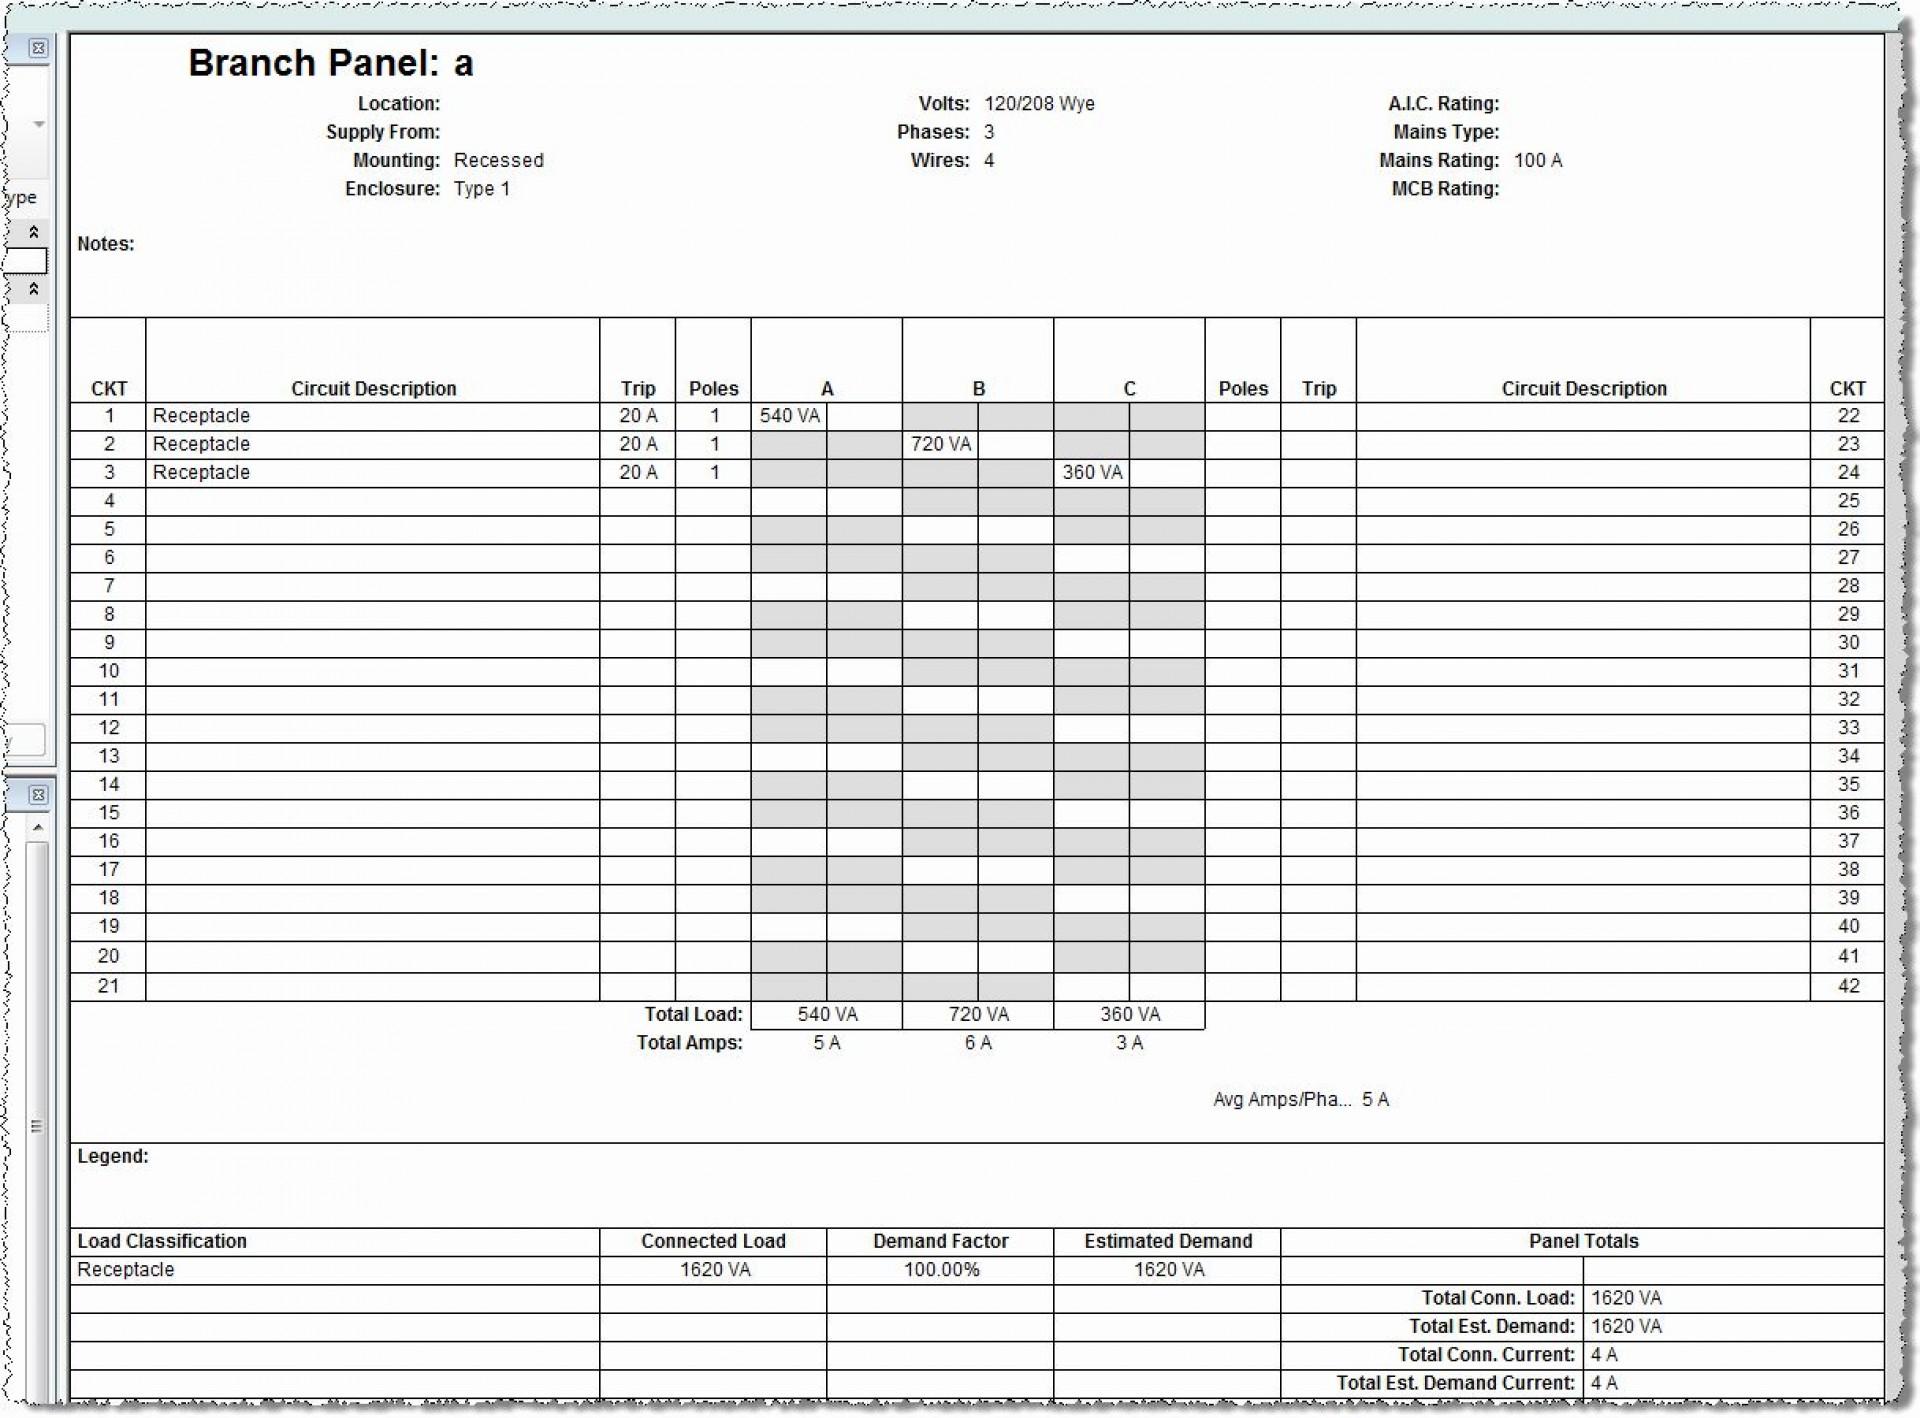 008 Unique Electrical Panel Label Template Sample  Siemen Free Excel1920